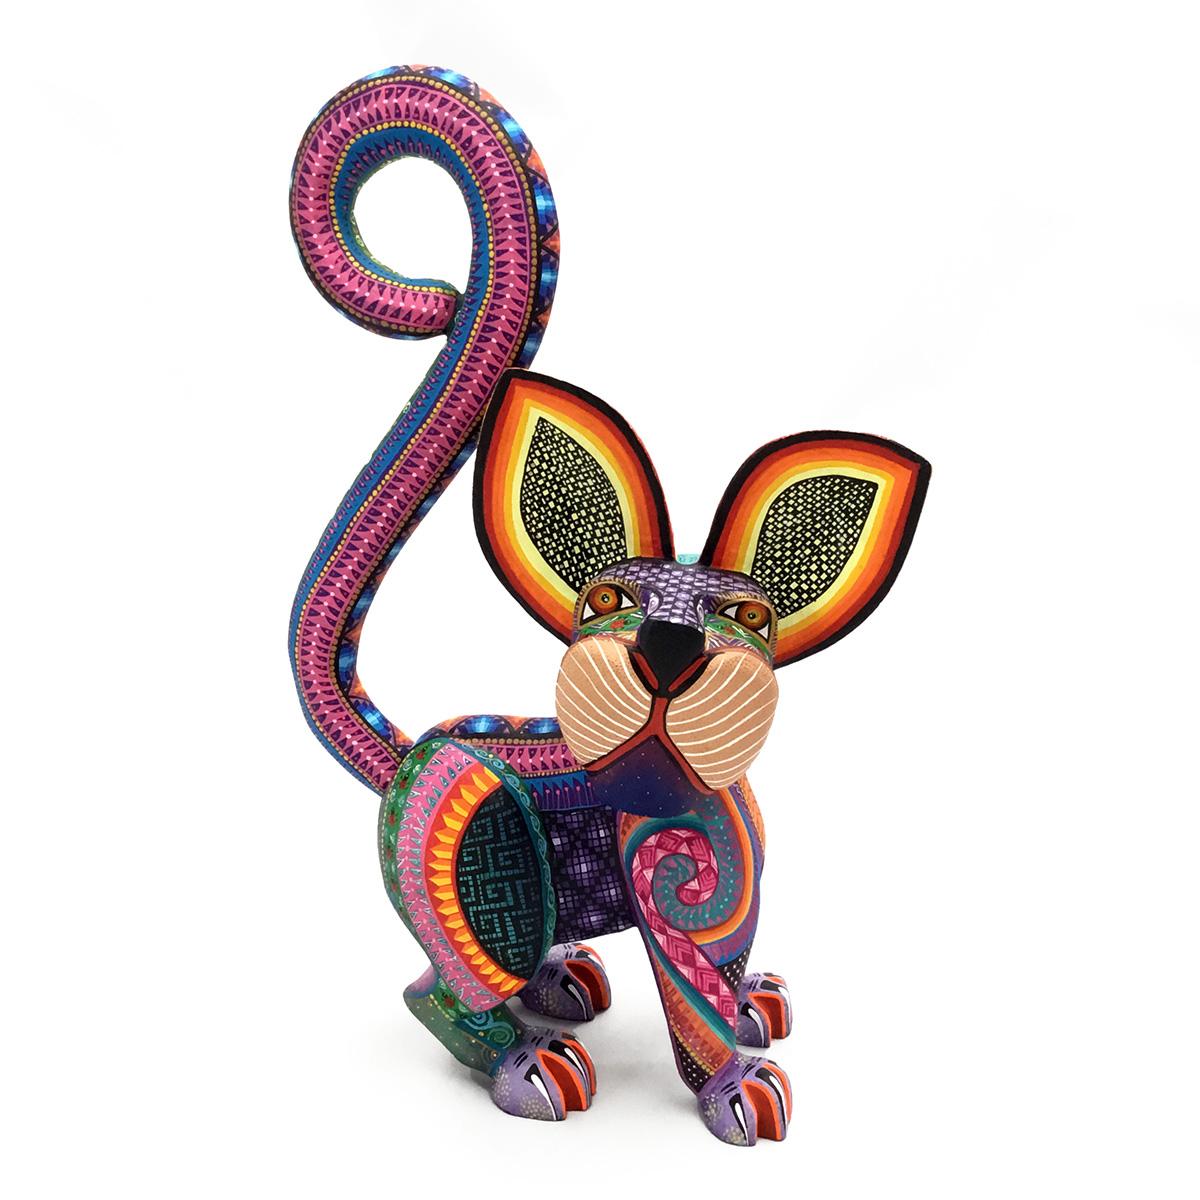 Ivan Fuentes & Mayte Calvo Ivan Fuentes & Mayte Calvo: Multicolor Cat Cats